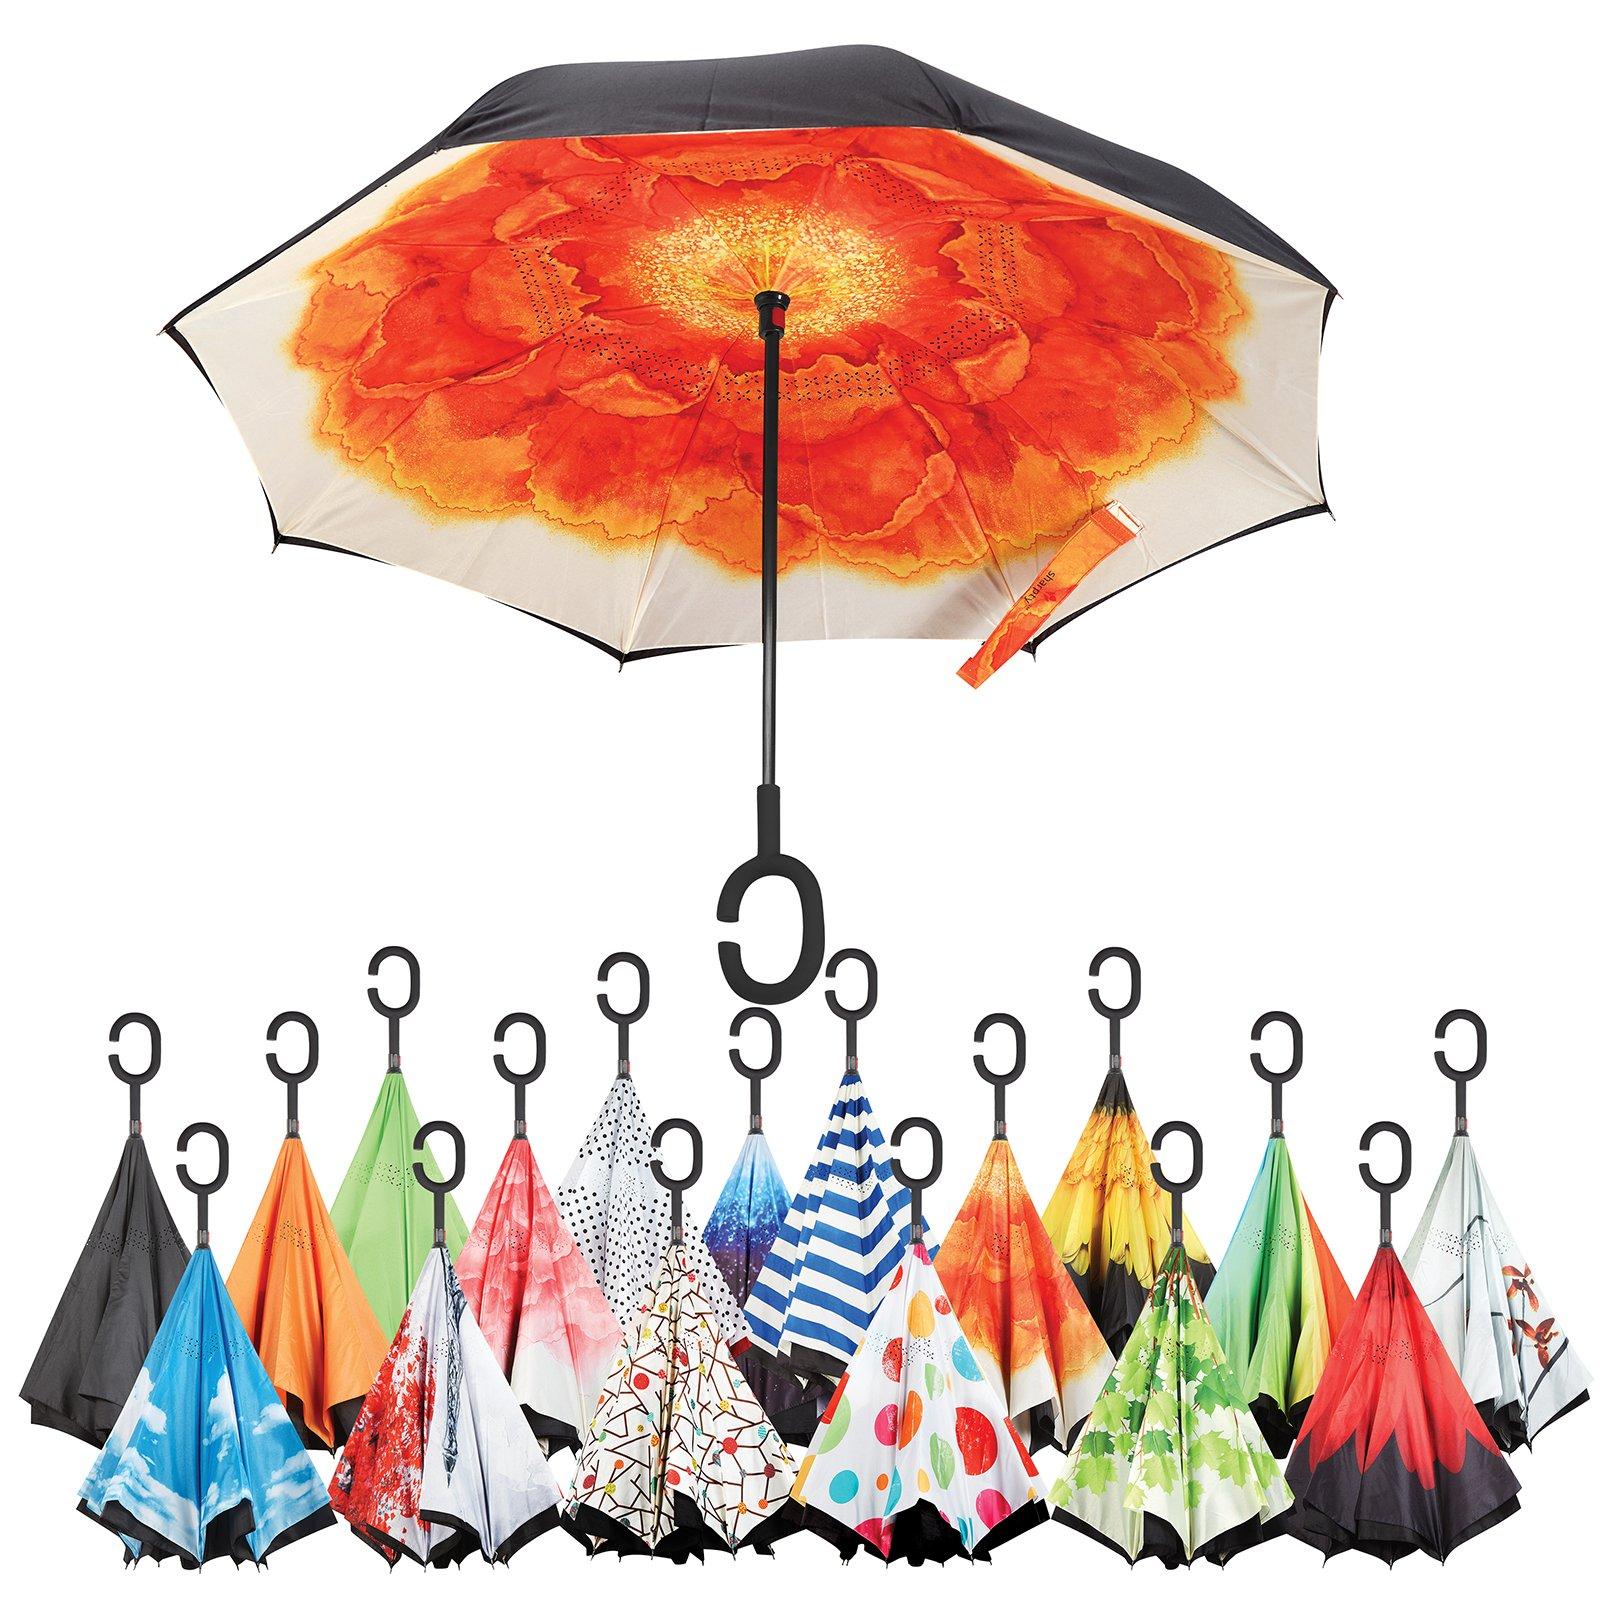 Sharpty Inverted Umbrella, Best Windproof Umbrella, Reverse Umbrella, Umbrella with UV Protection, Upside Down Umbrella with C-Shaped Handle (Orange Flower)